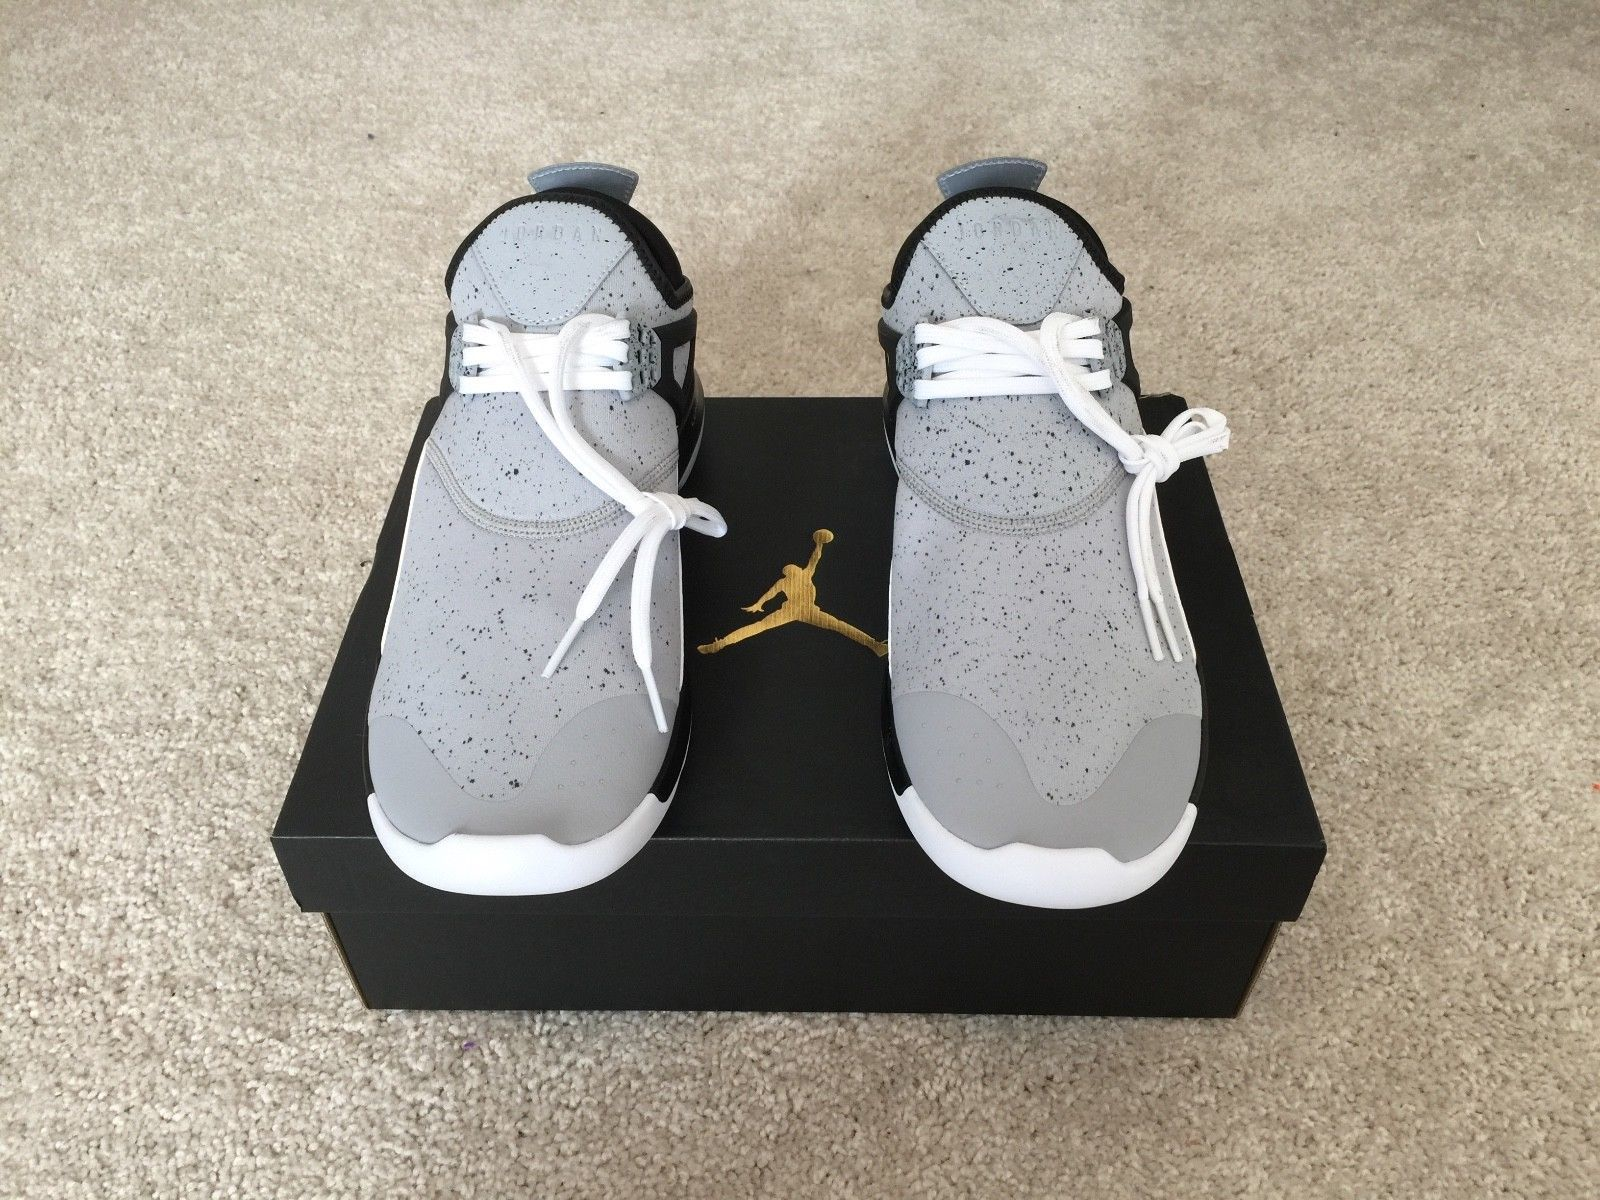 7913a6382a680 NIB Air Jordan Mens Fly  89 Basketball Shoe Wolf Grey Black 940267 013 Size  10.5